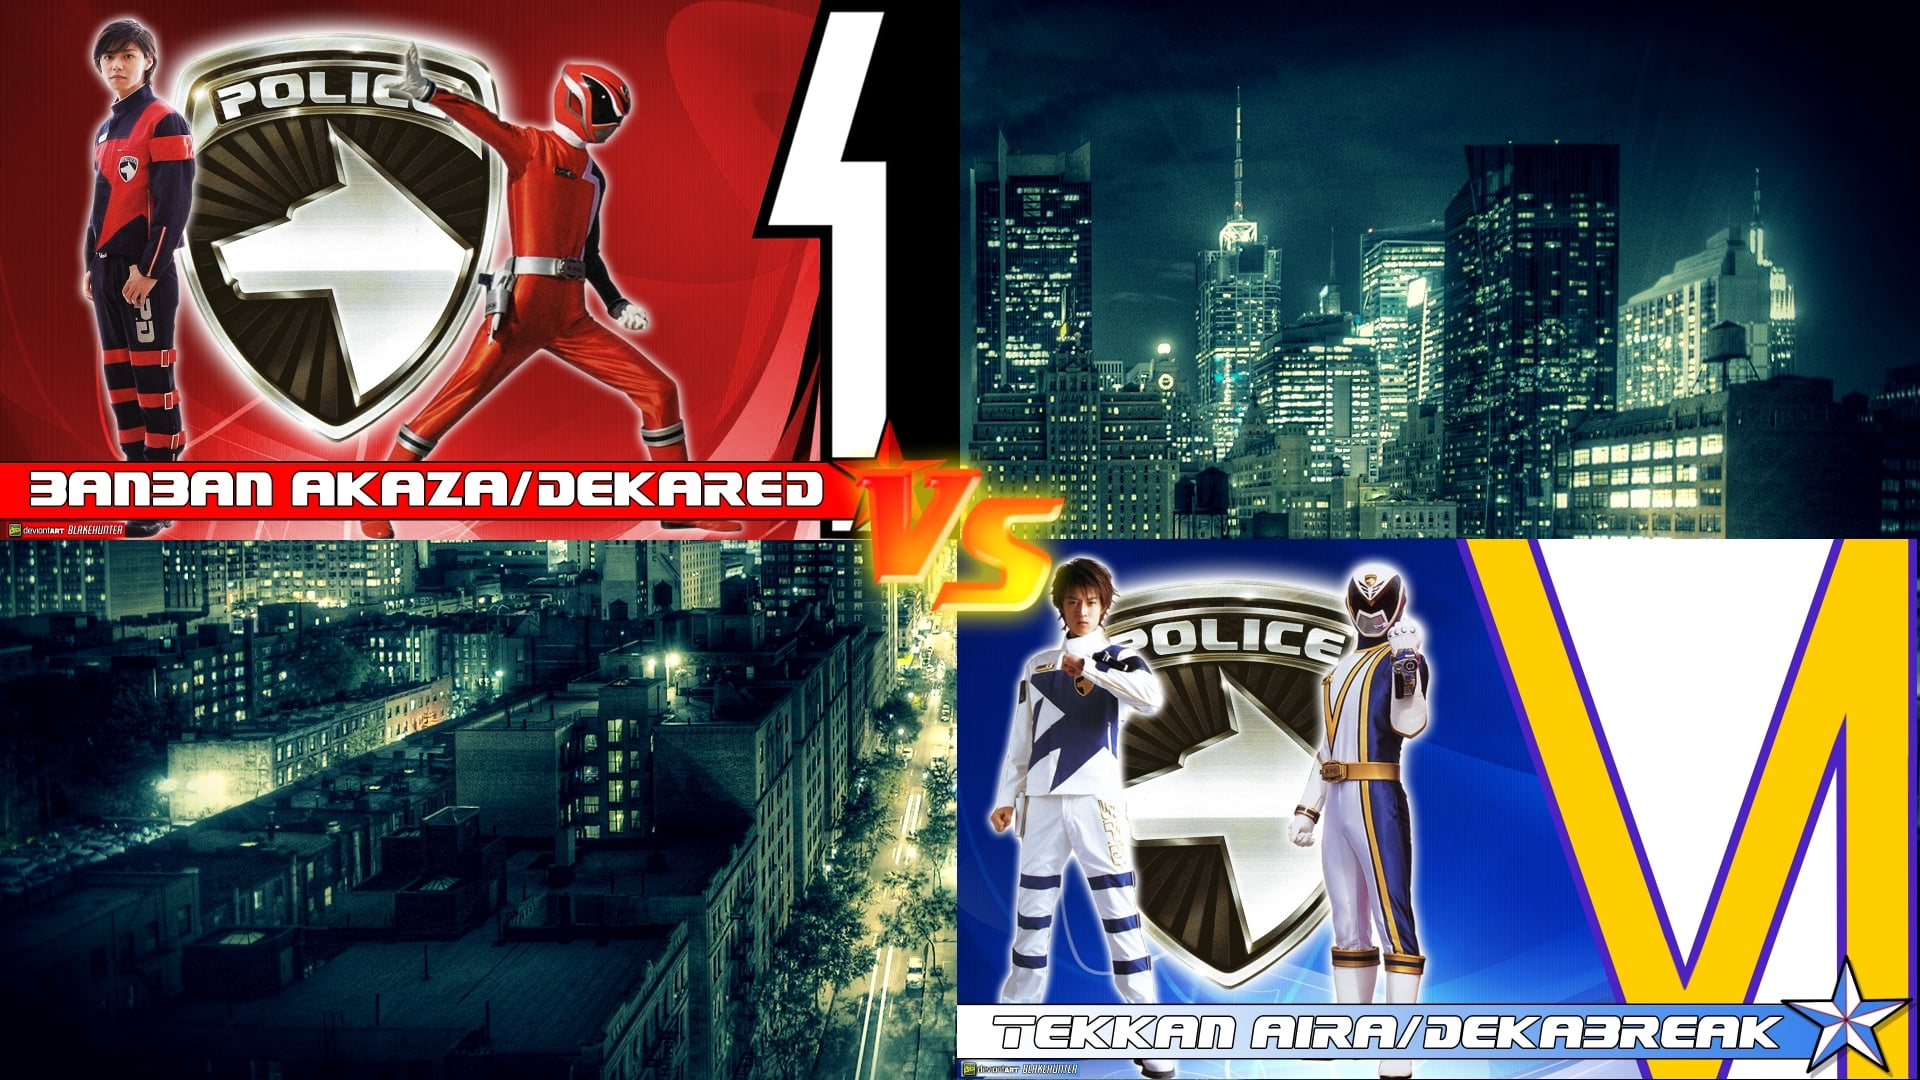 Tokusou Sentai Dekaranger Super Video: Super Finisher Match! Deka Red vs. Deka Break